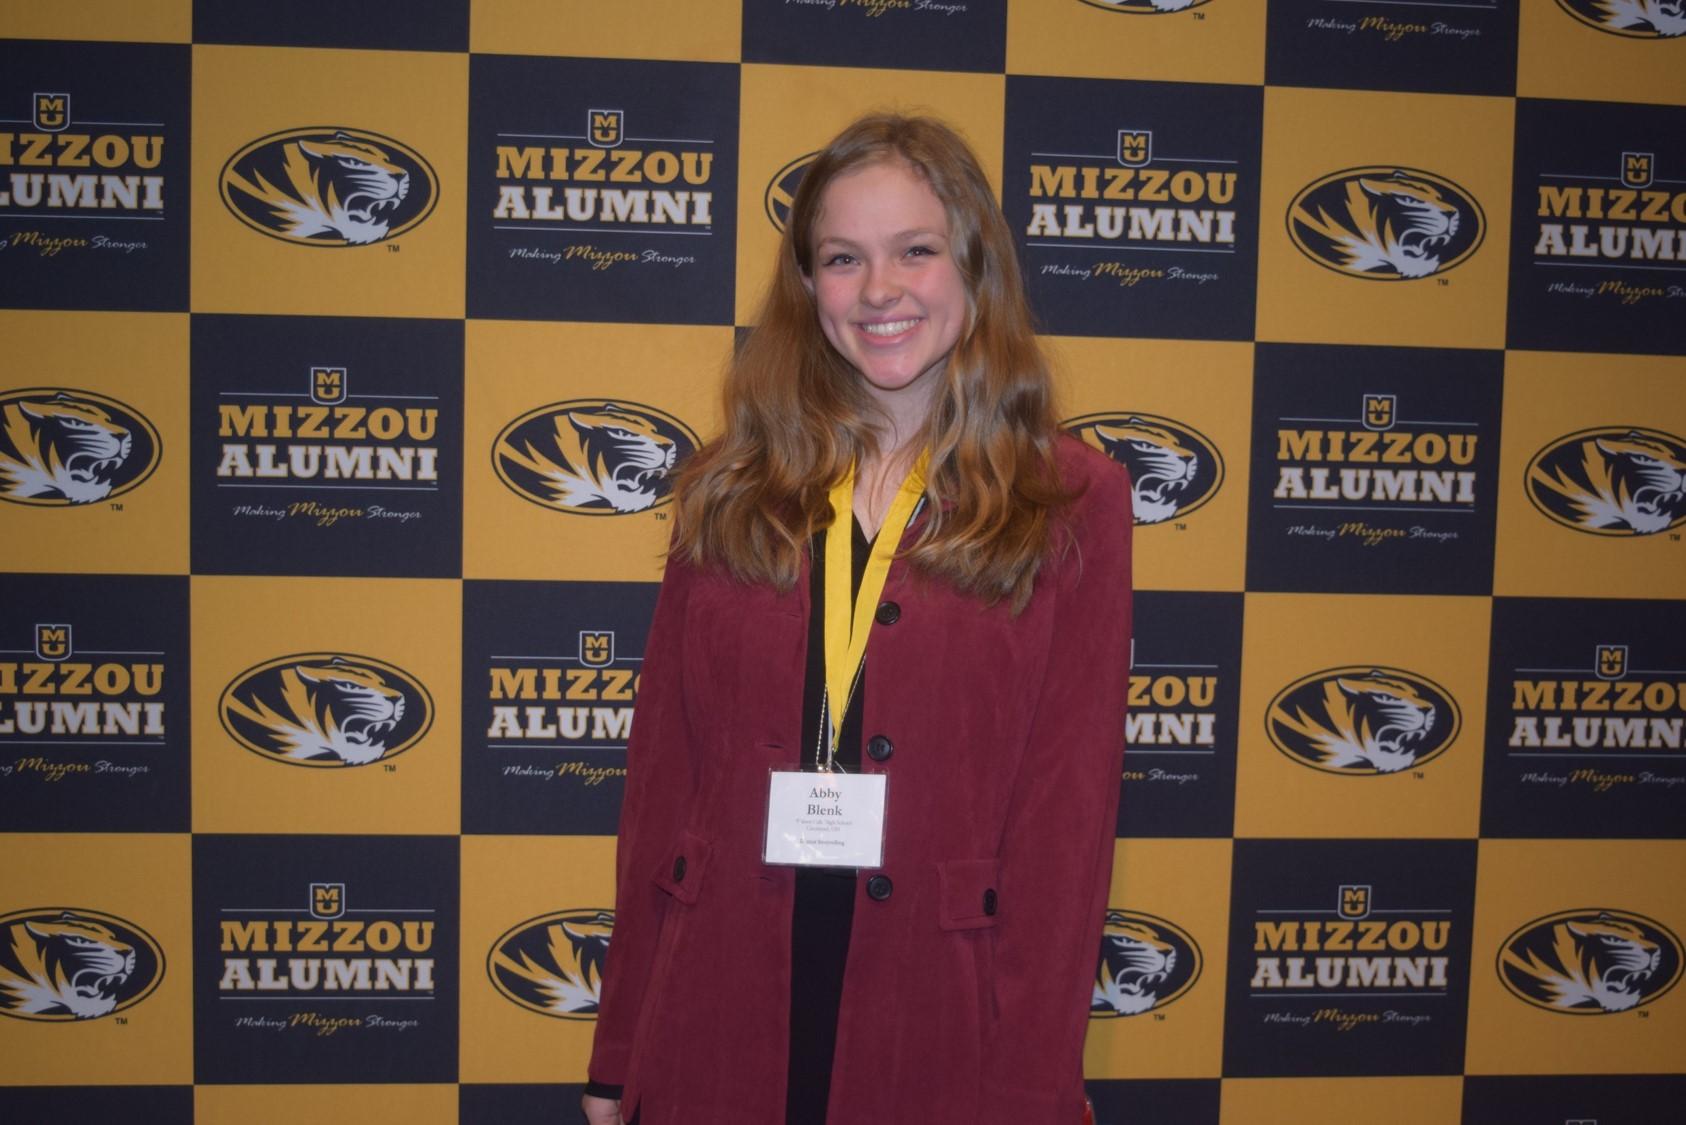 Profile photo of Abby Blenk